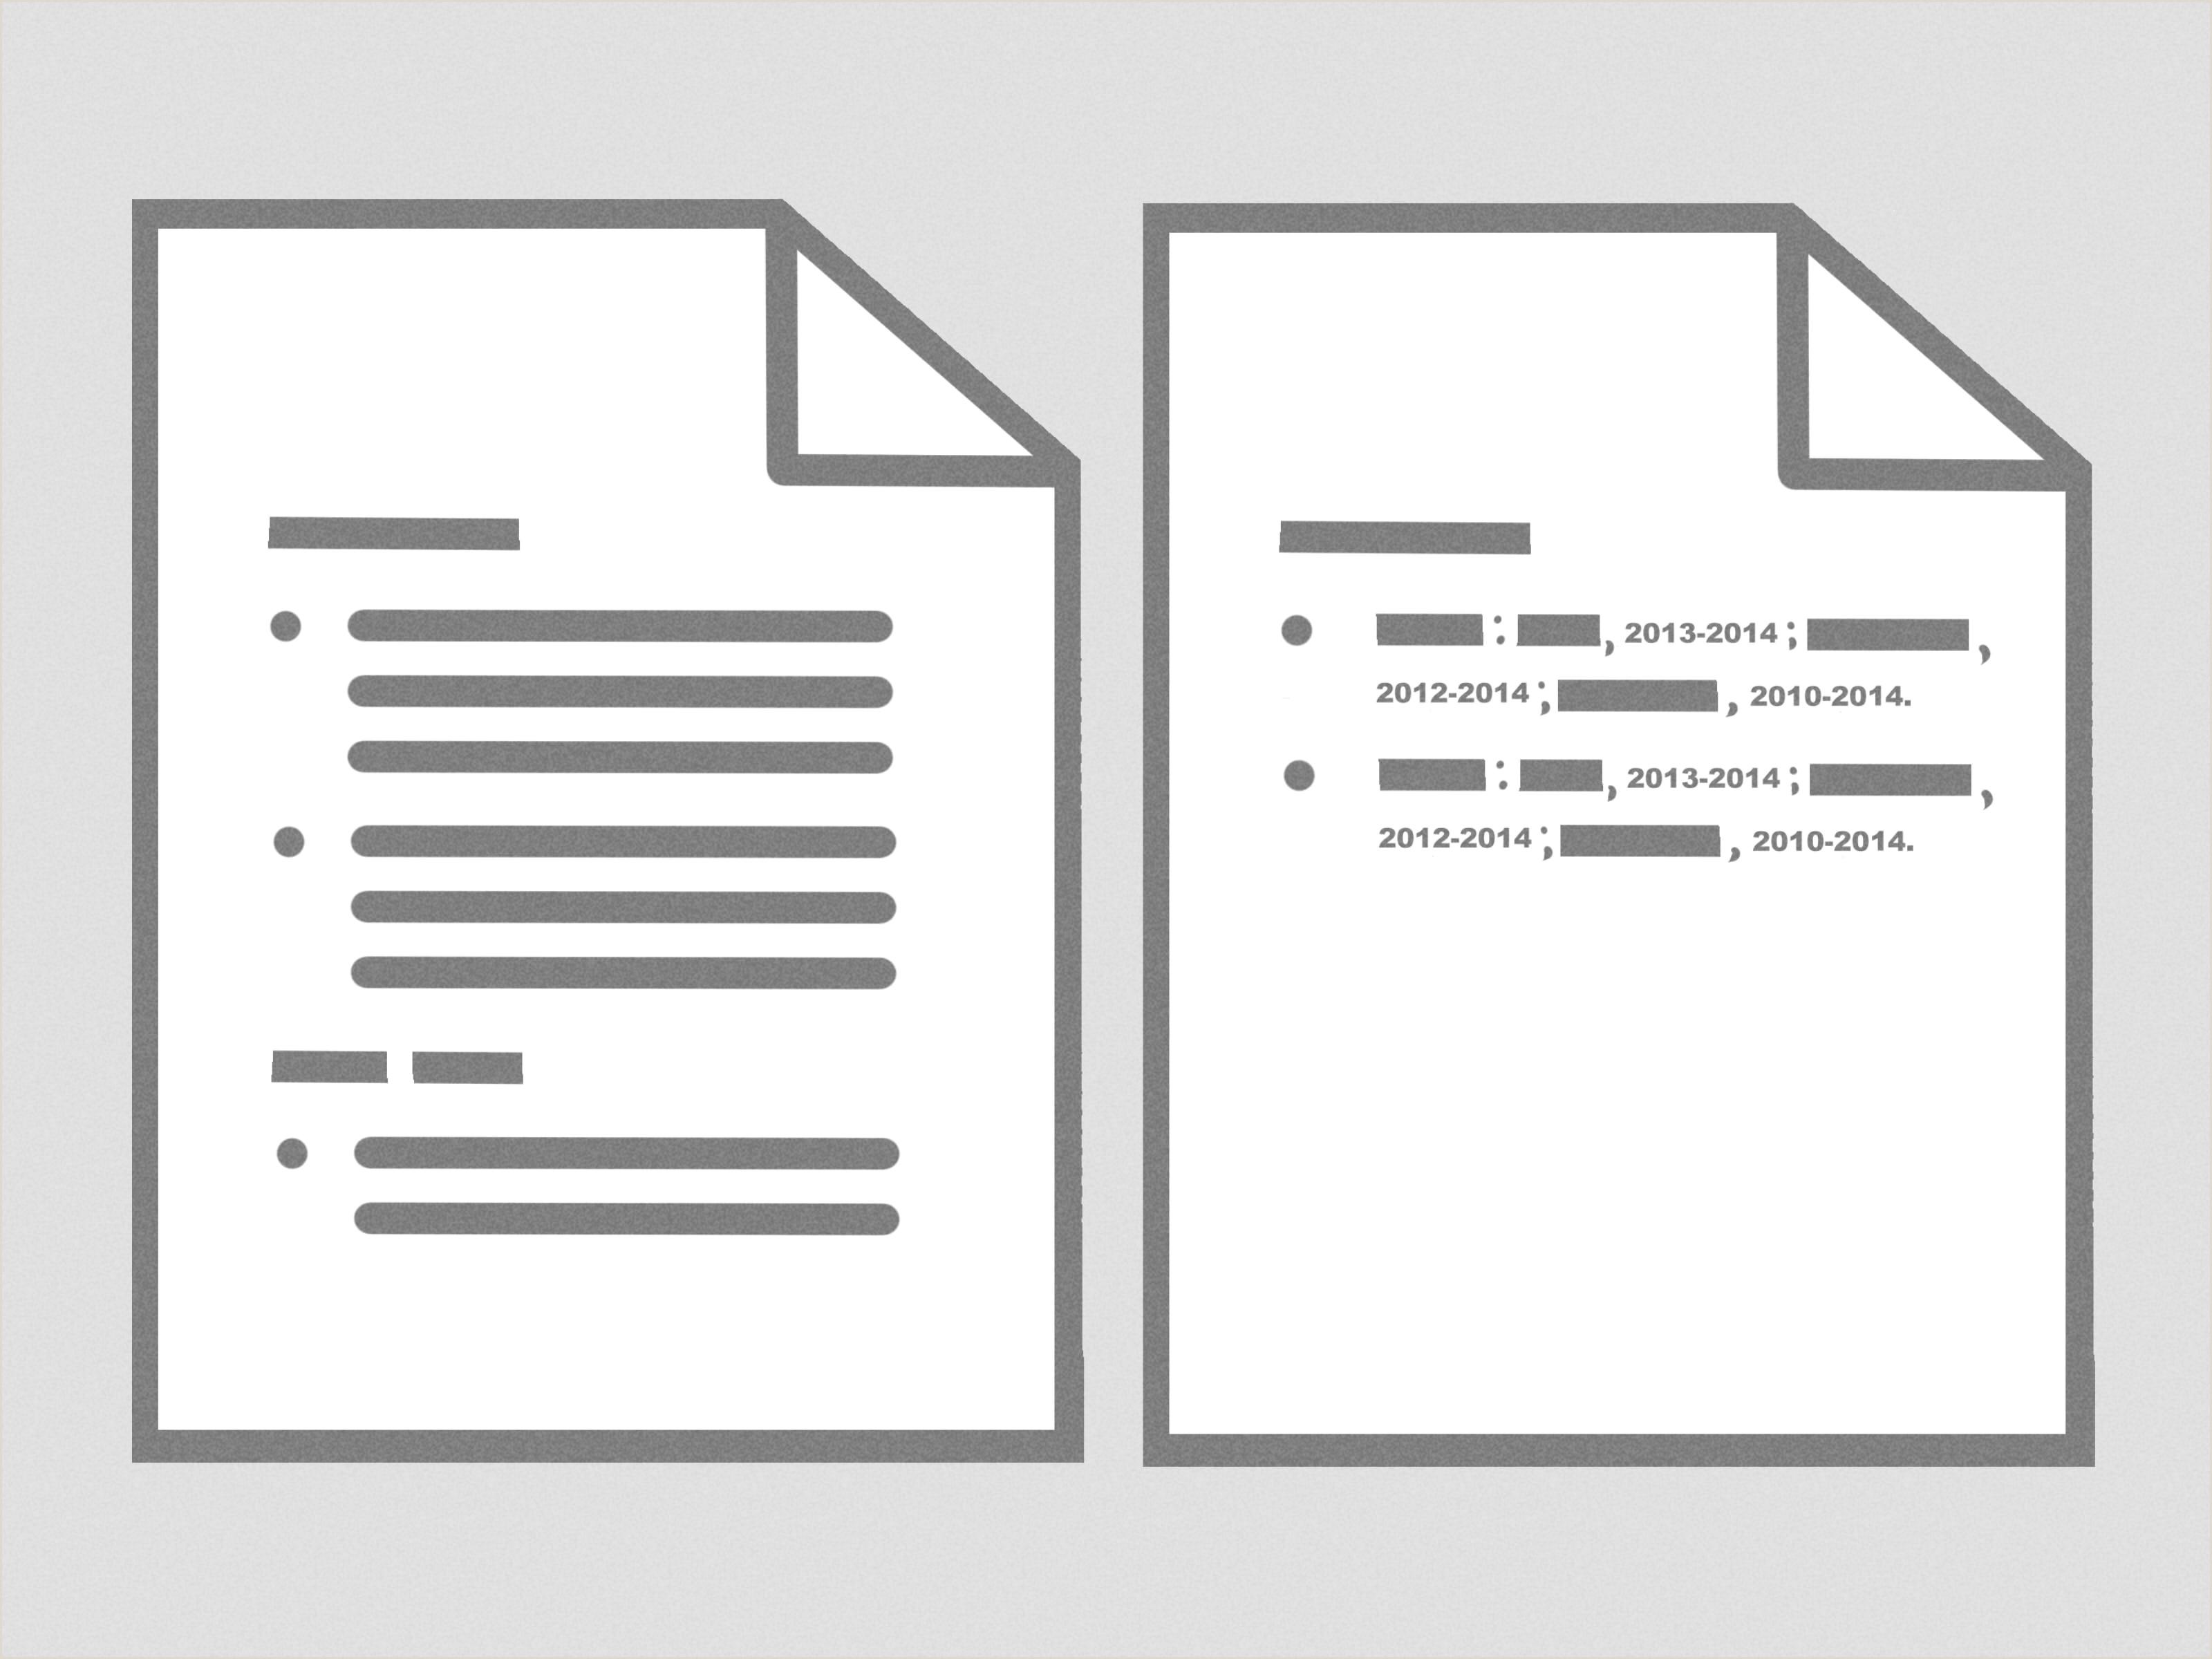 Curriculo Simples E Bonito 4 formas De Escrever sobre Si Mesmo Wikihow